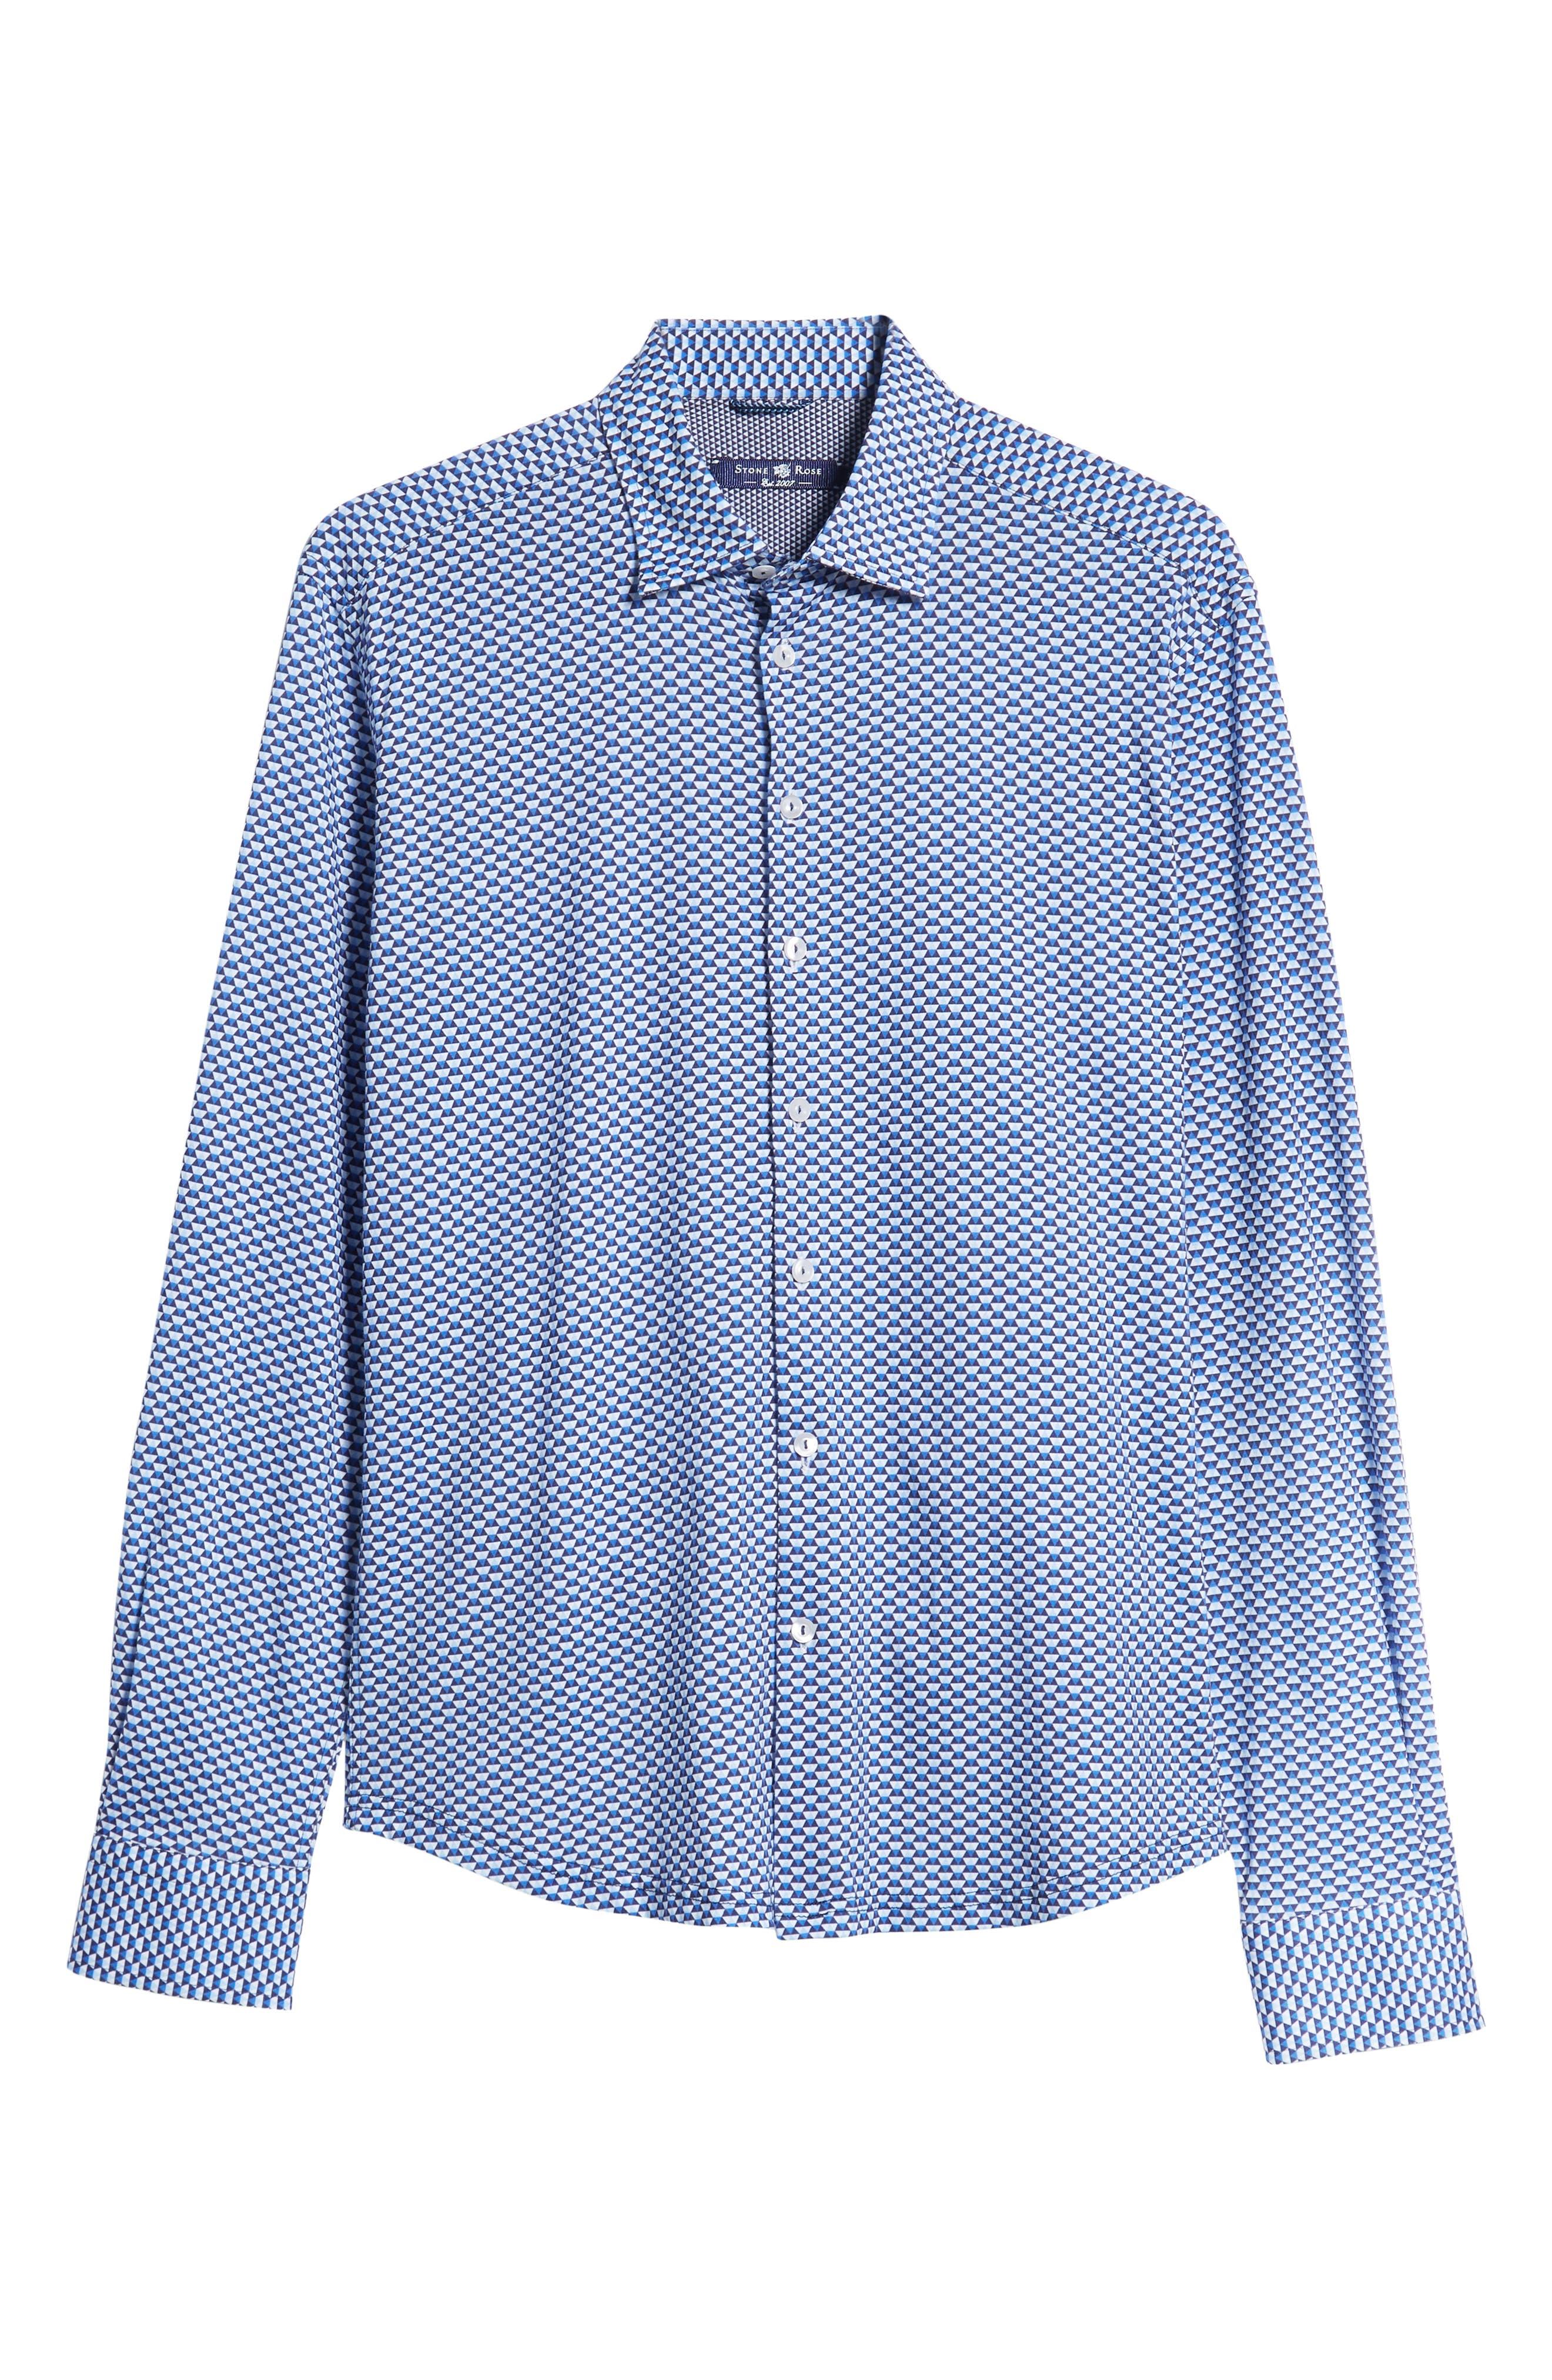 Trim Fit Knit Sport Shirt,                             Alternate thumbnail 5, color,                             WHITE